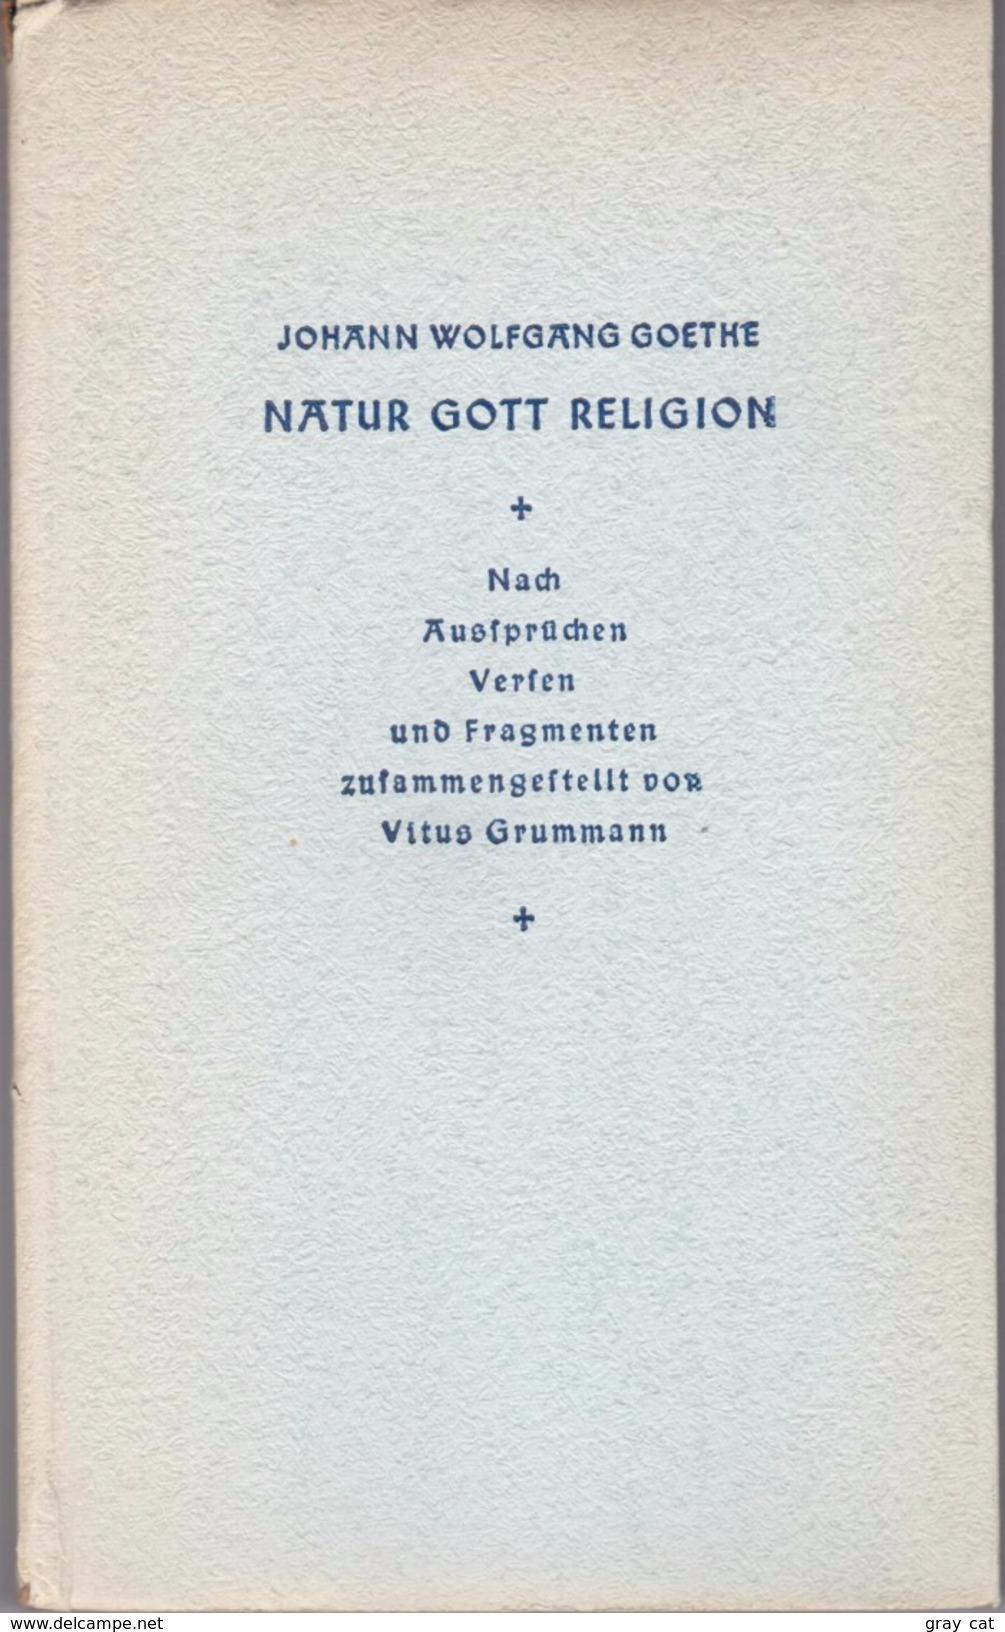 Natur, Gott, Religion By Wolfgang Goethe, Johann Und Vitus Grummann - Books, Magazines, Comics